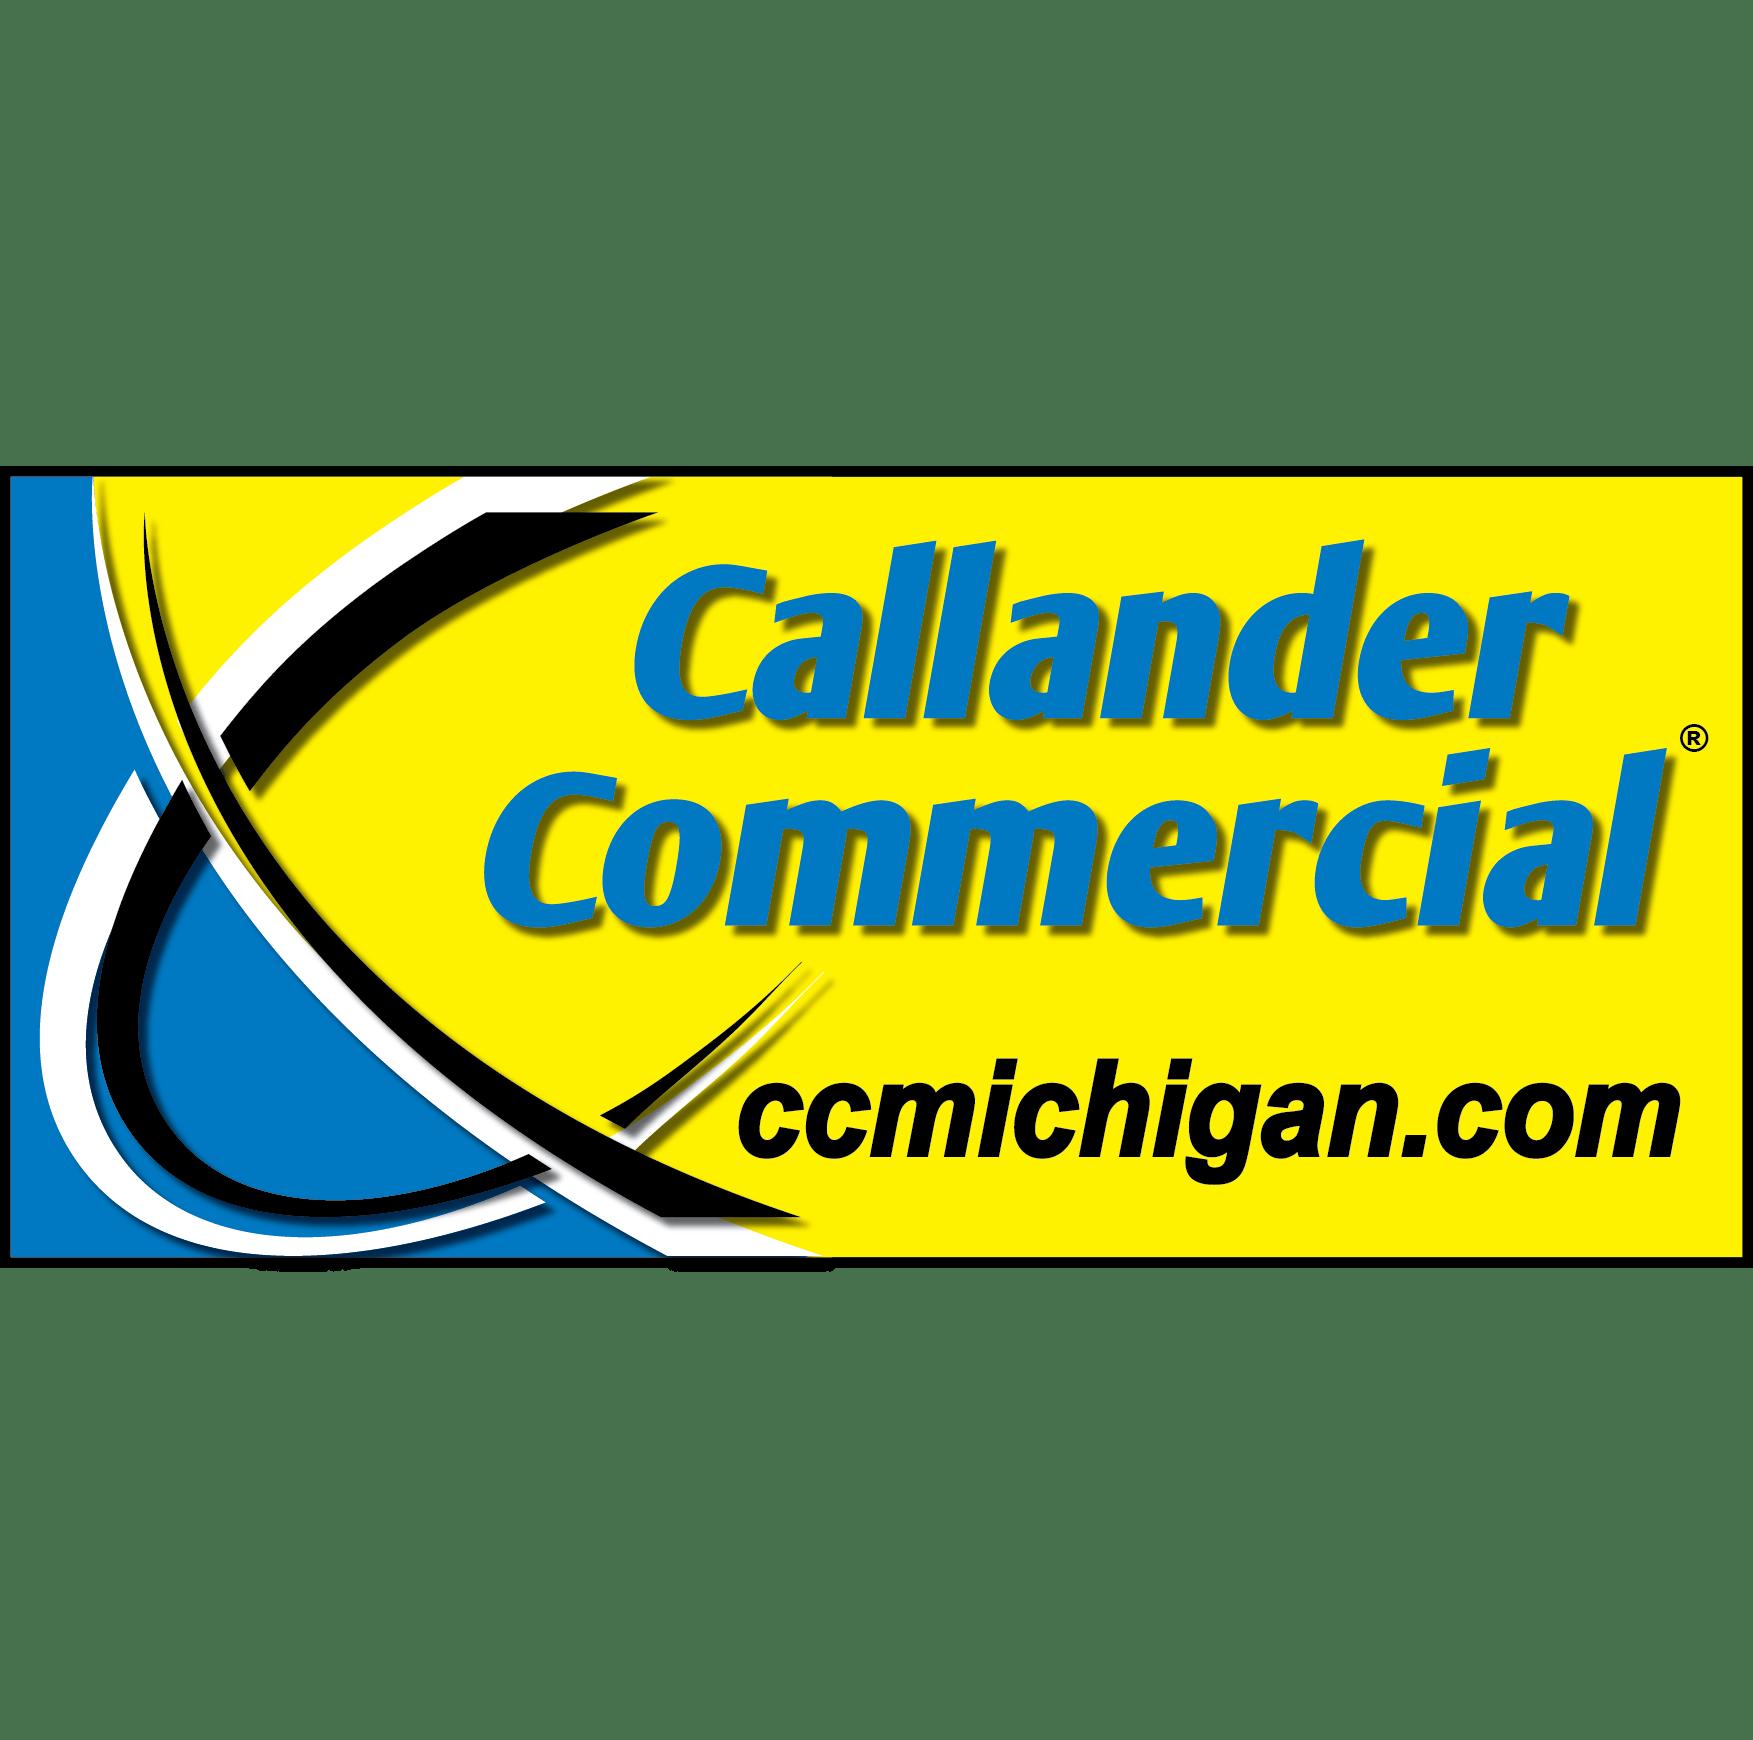 Profile image of Callander Commercial